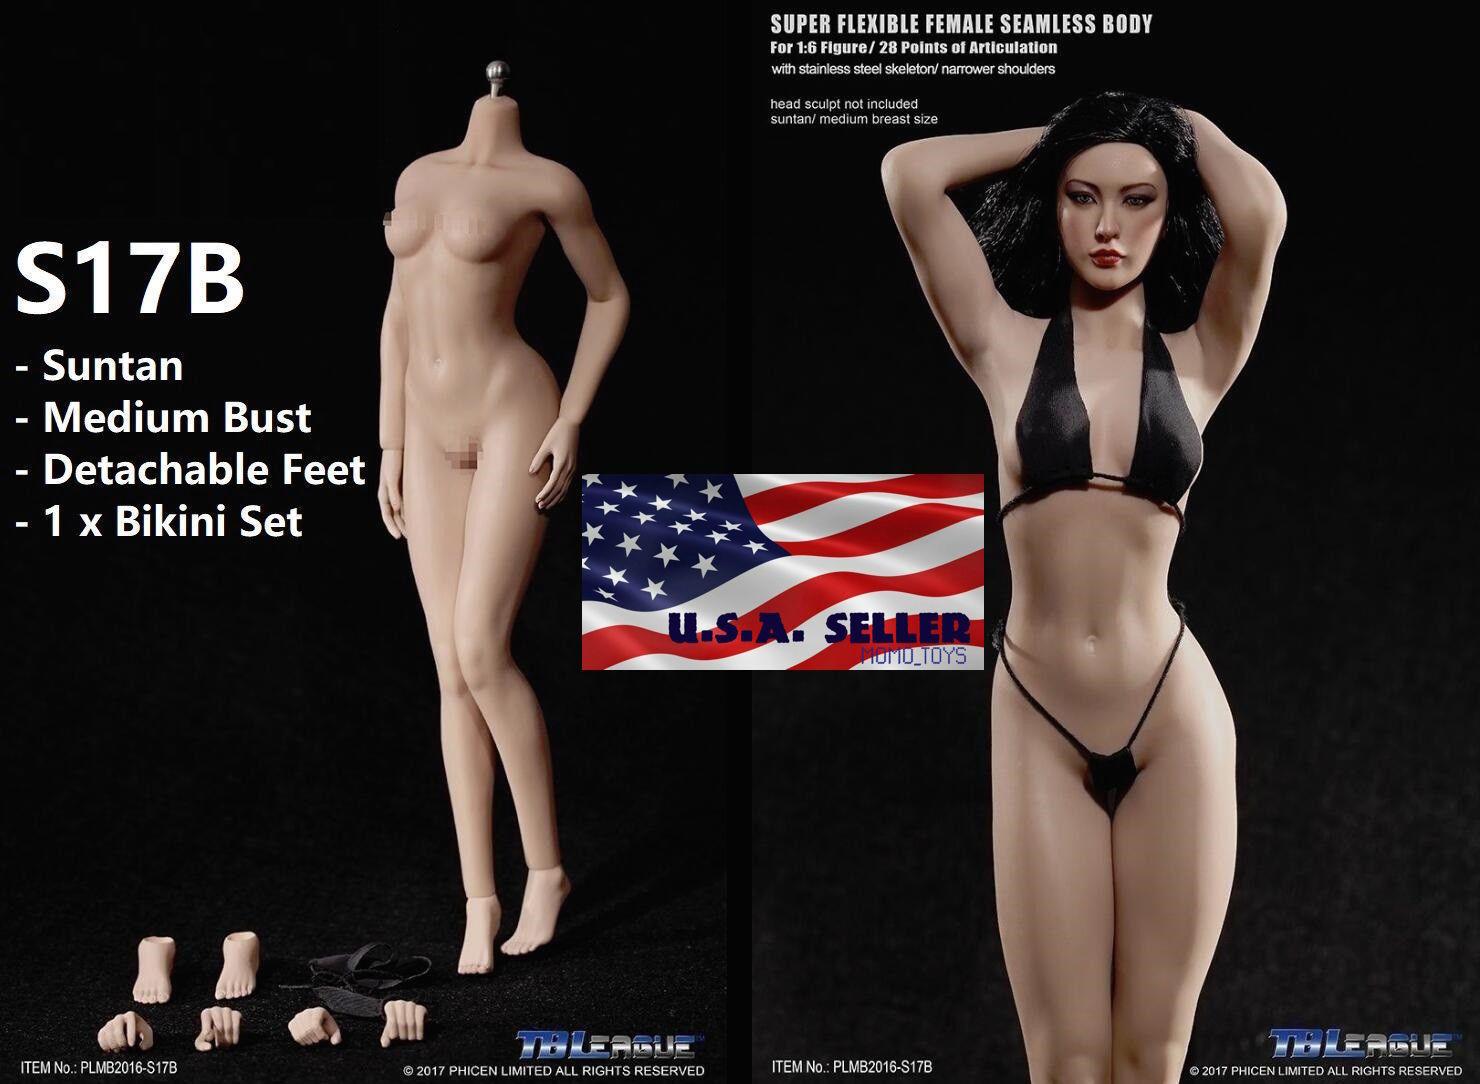 PHICEN 1 6 S17B Seamless Steel Skeleton M Bust Female Body SUNTAN TBLeague USA